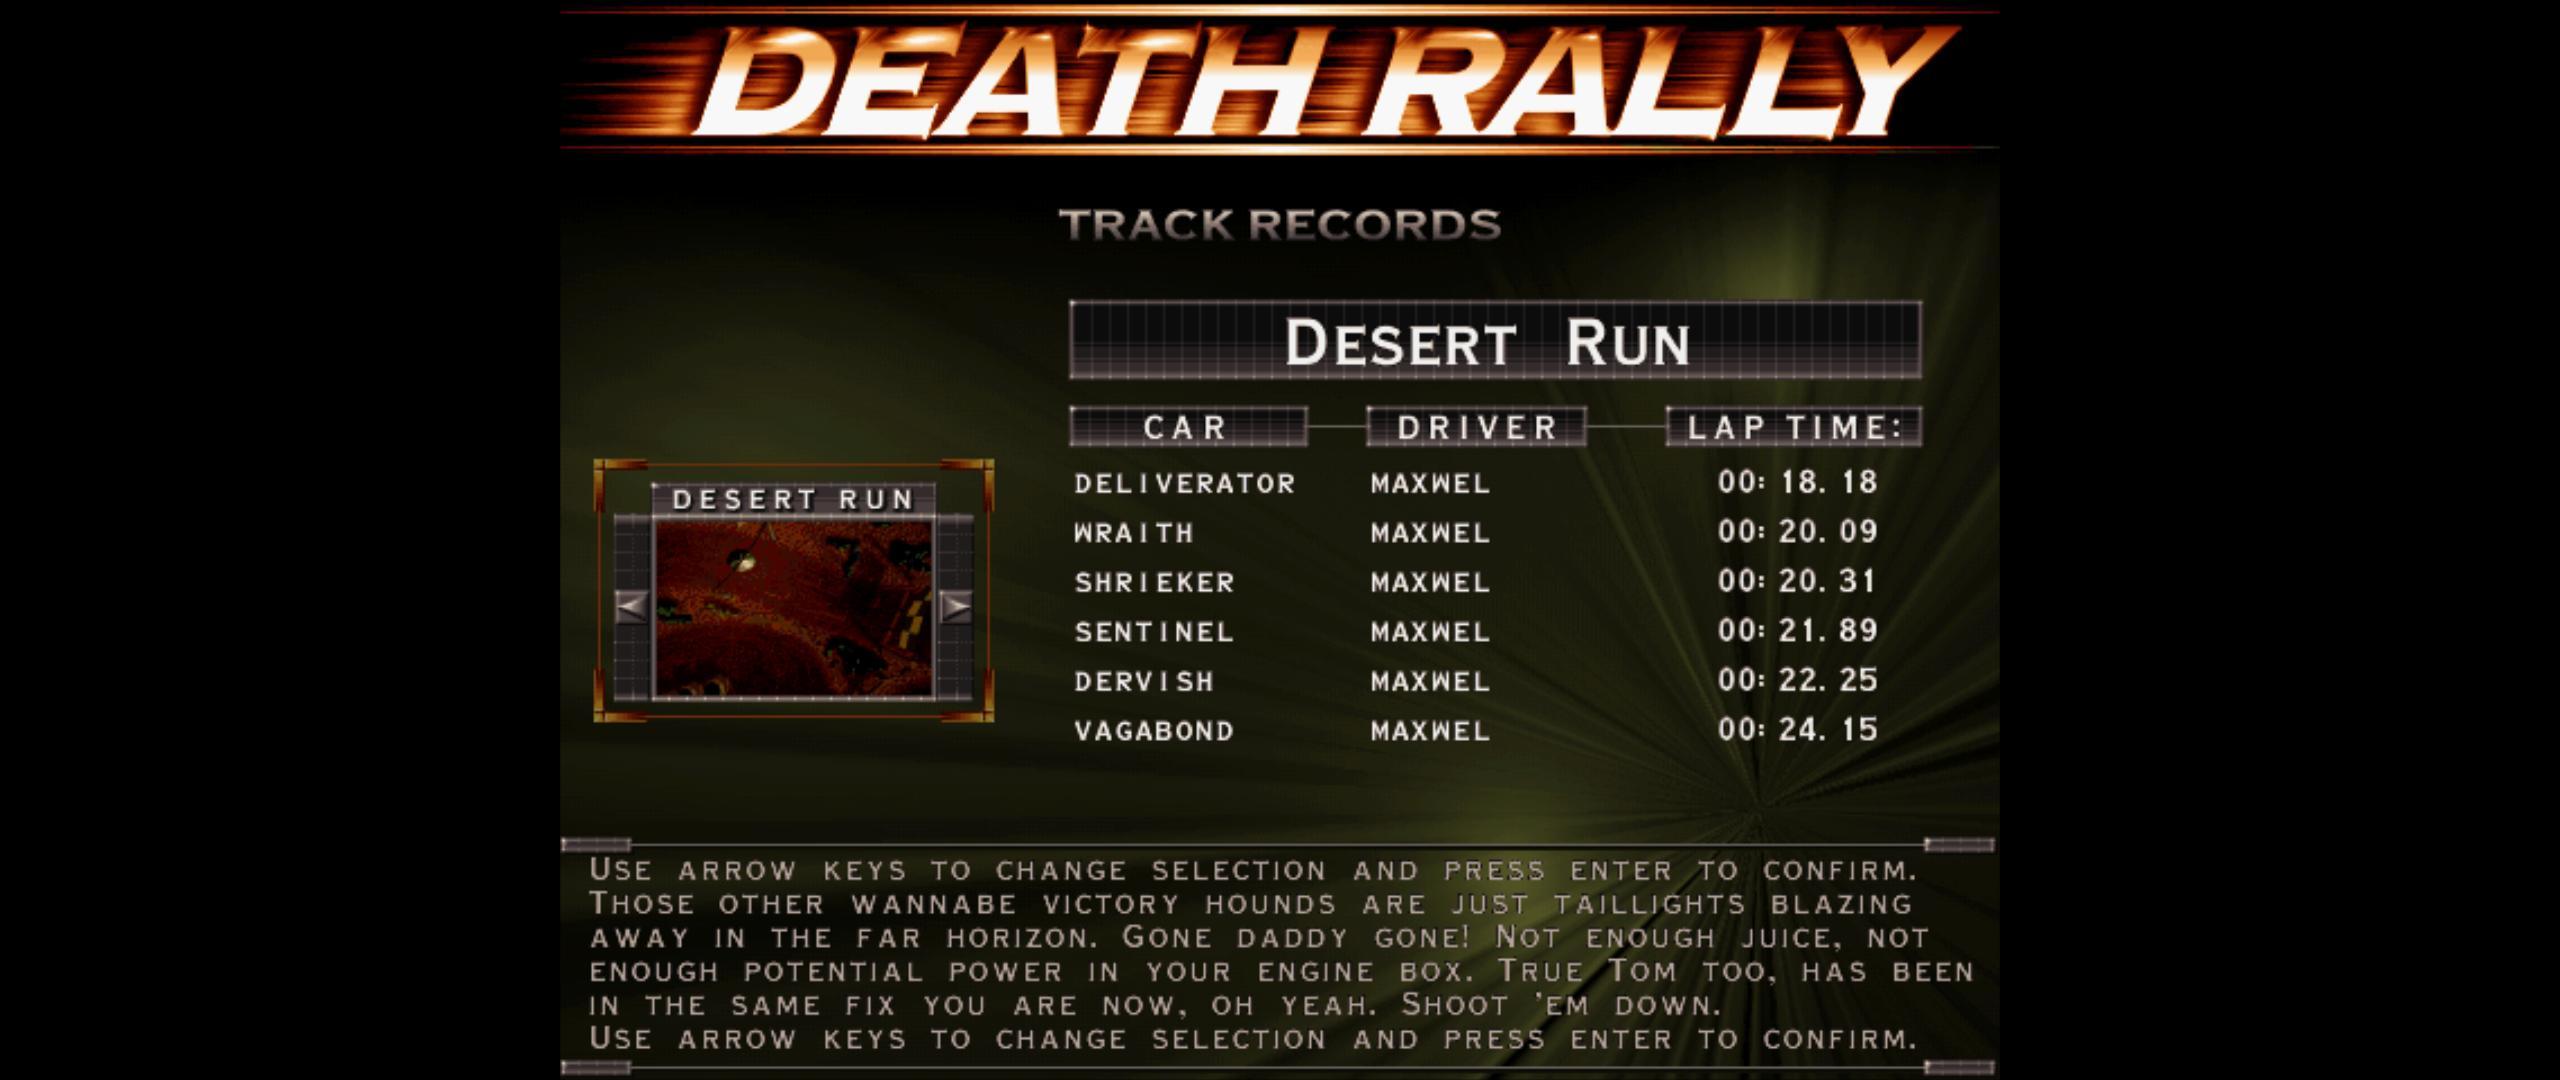 Maxwel: Death Rally [Desert Run, Vagabond Car] (PC) 0:00:24.15 points on 2016-03-04 06:56:44